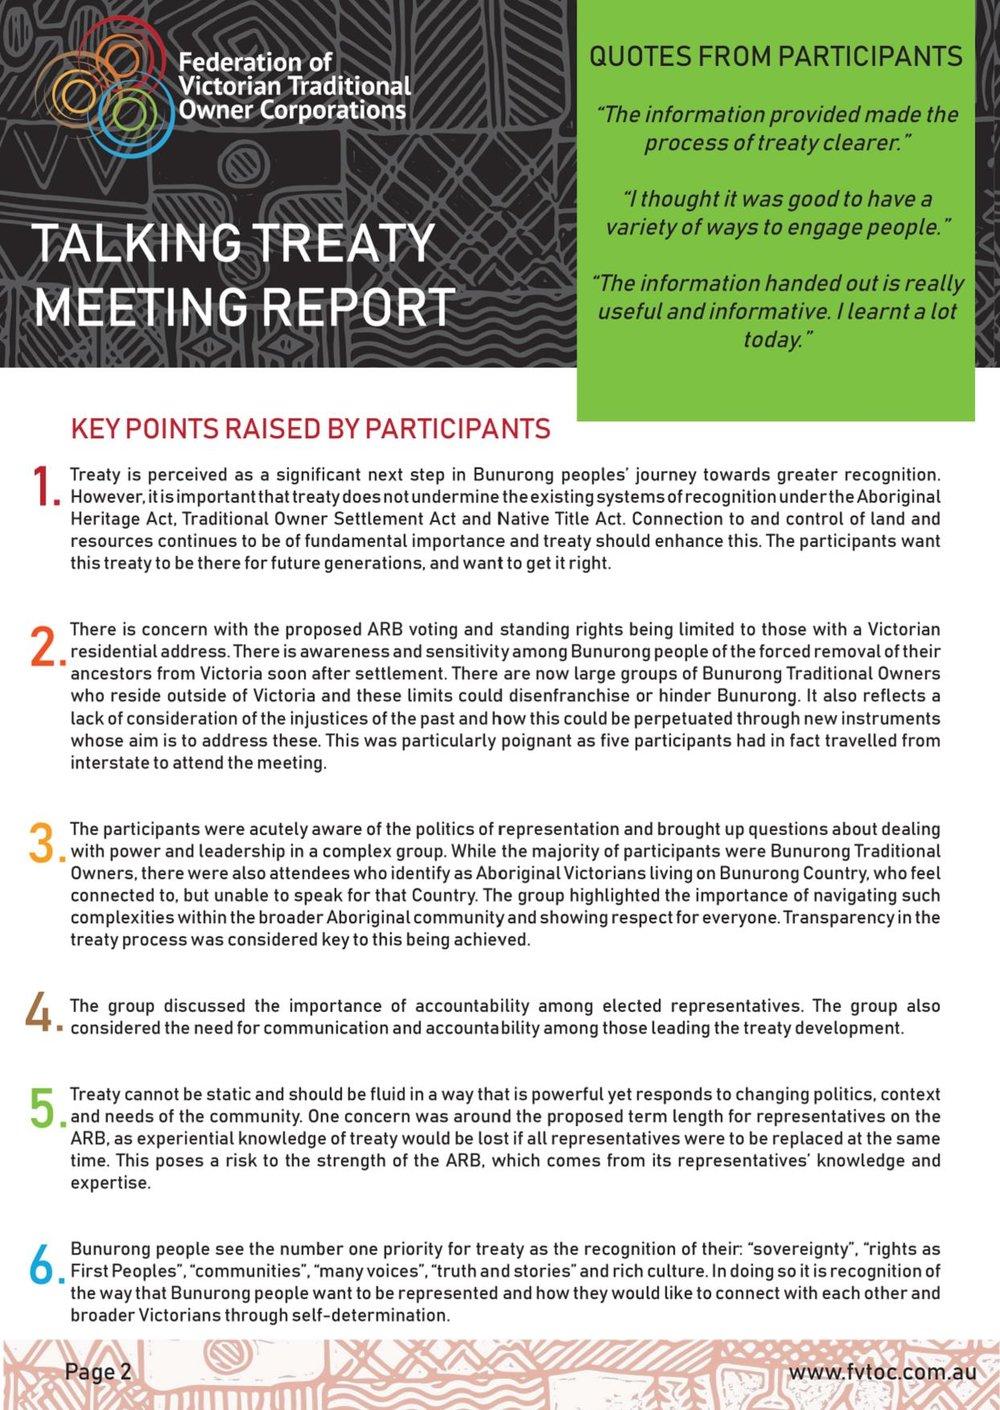 Talking Treaty Frankston Report Snapshot P2.jpg